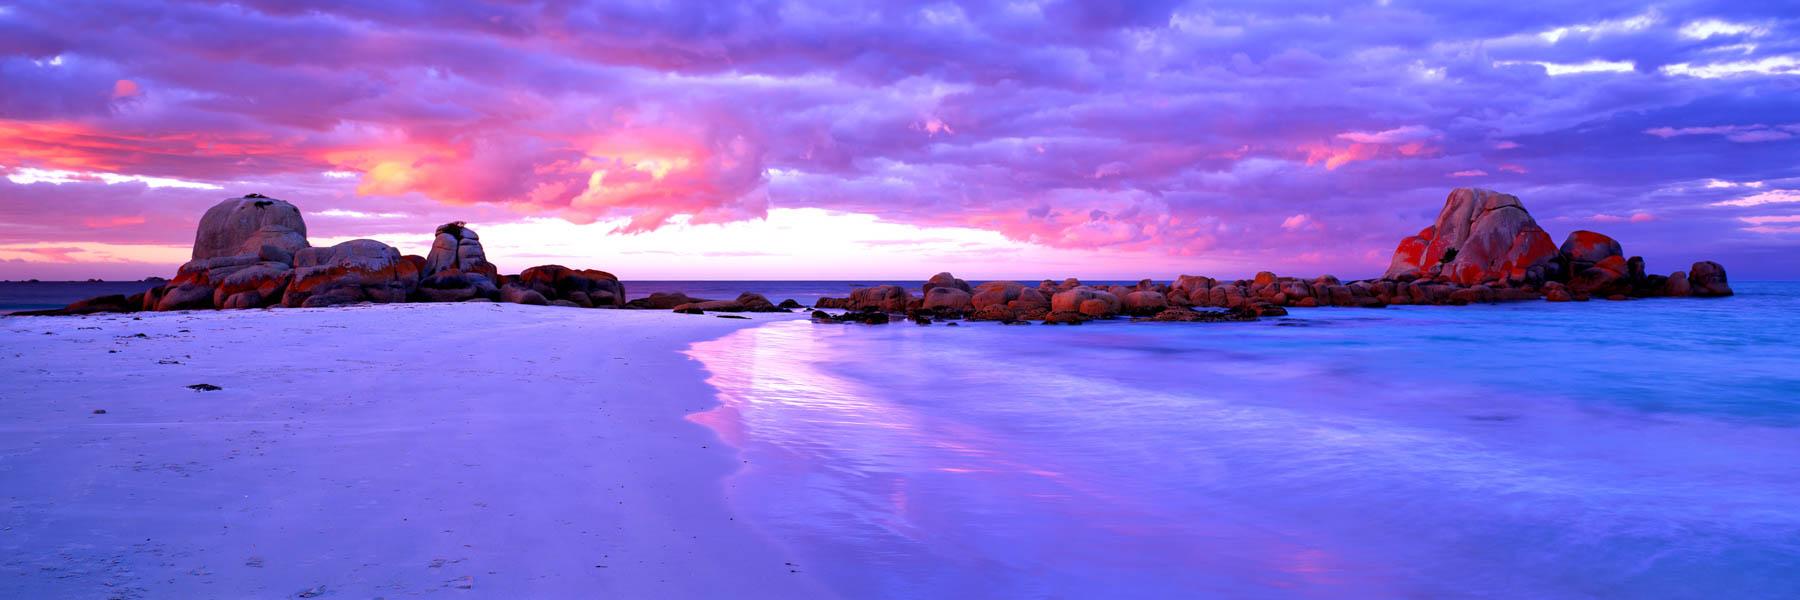 A pastel sunrise lighting up the rocks and sky at Picnic Rocks, Bay of Fires, Tasmania, Australia.